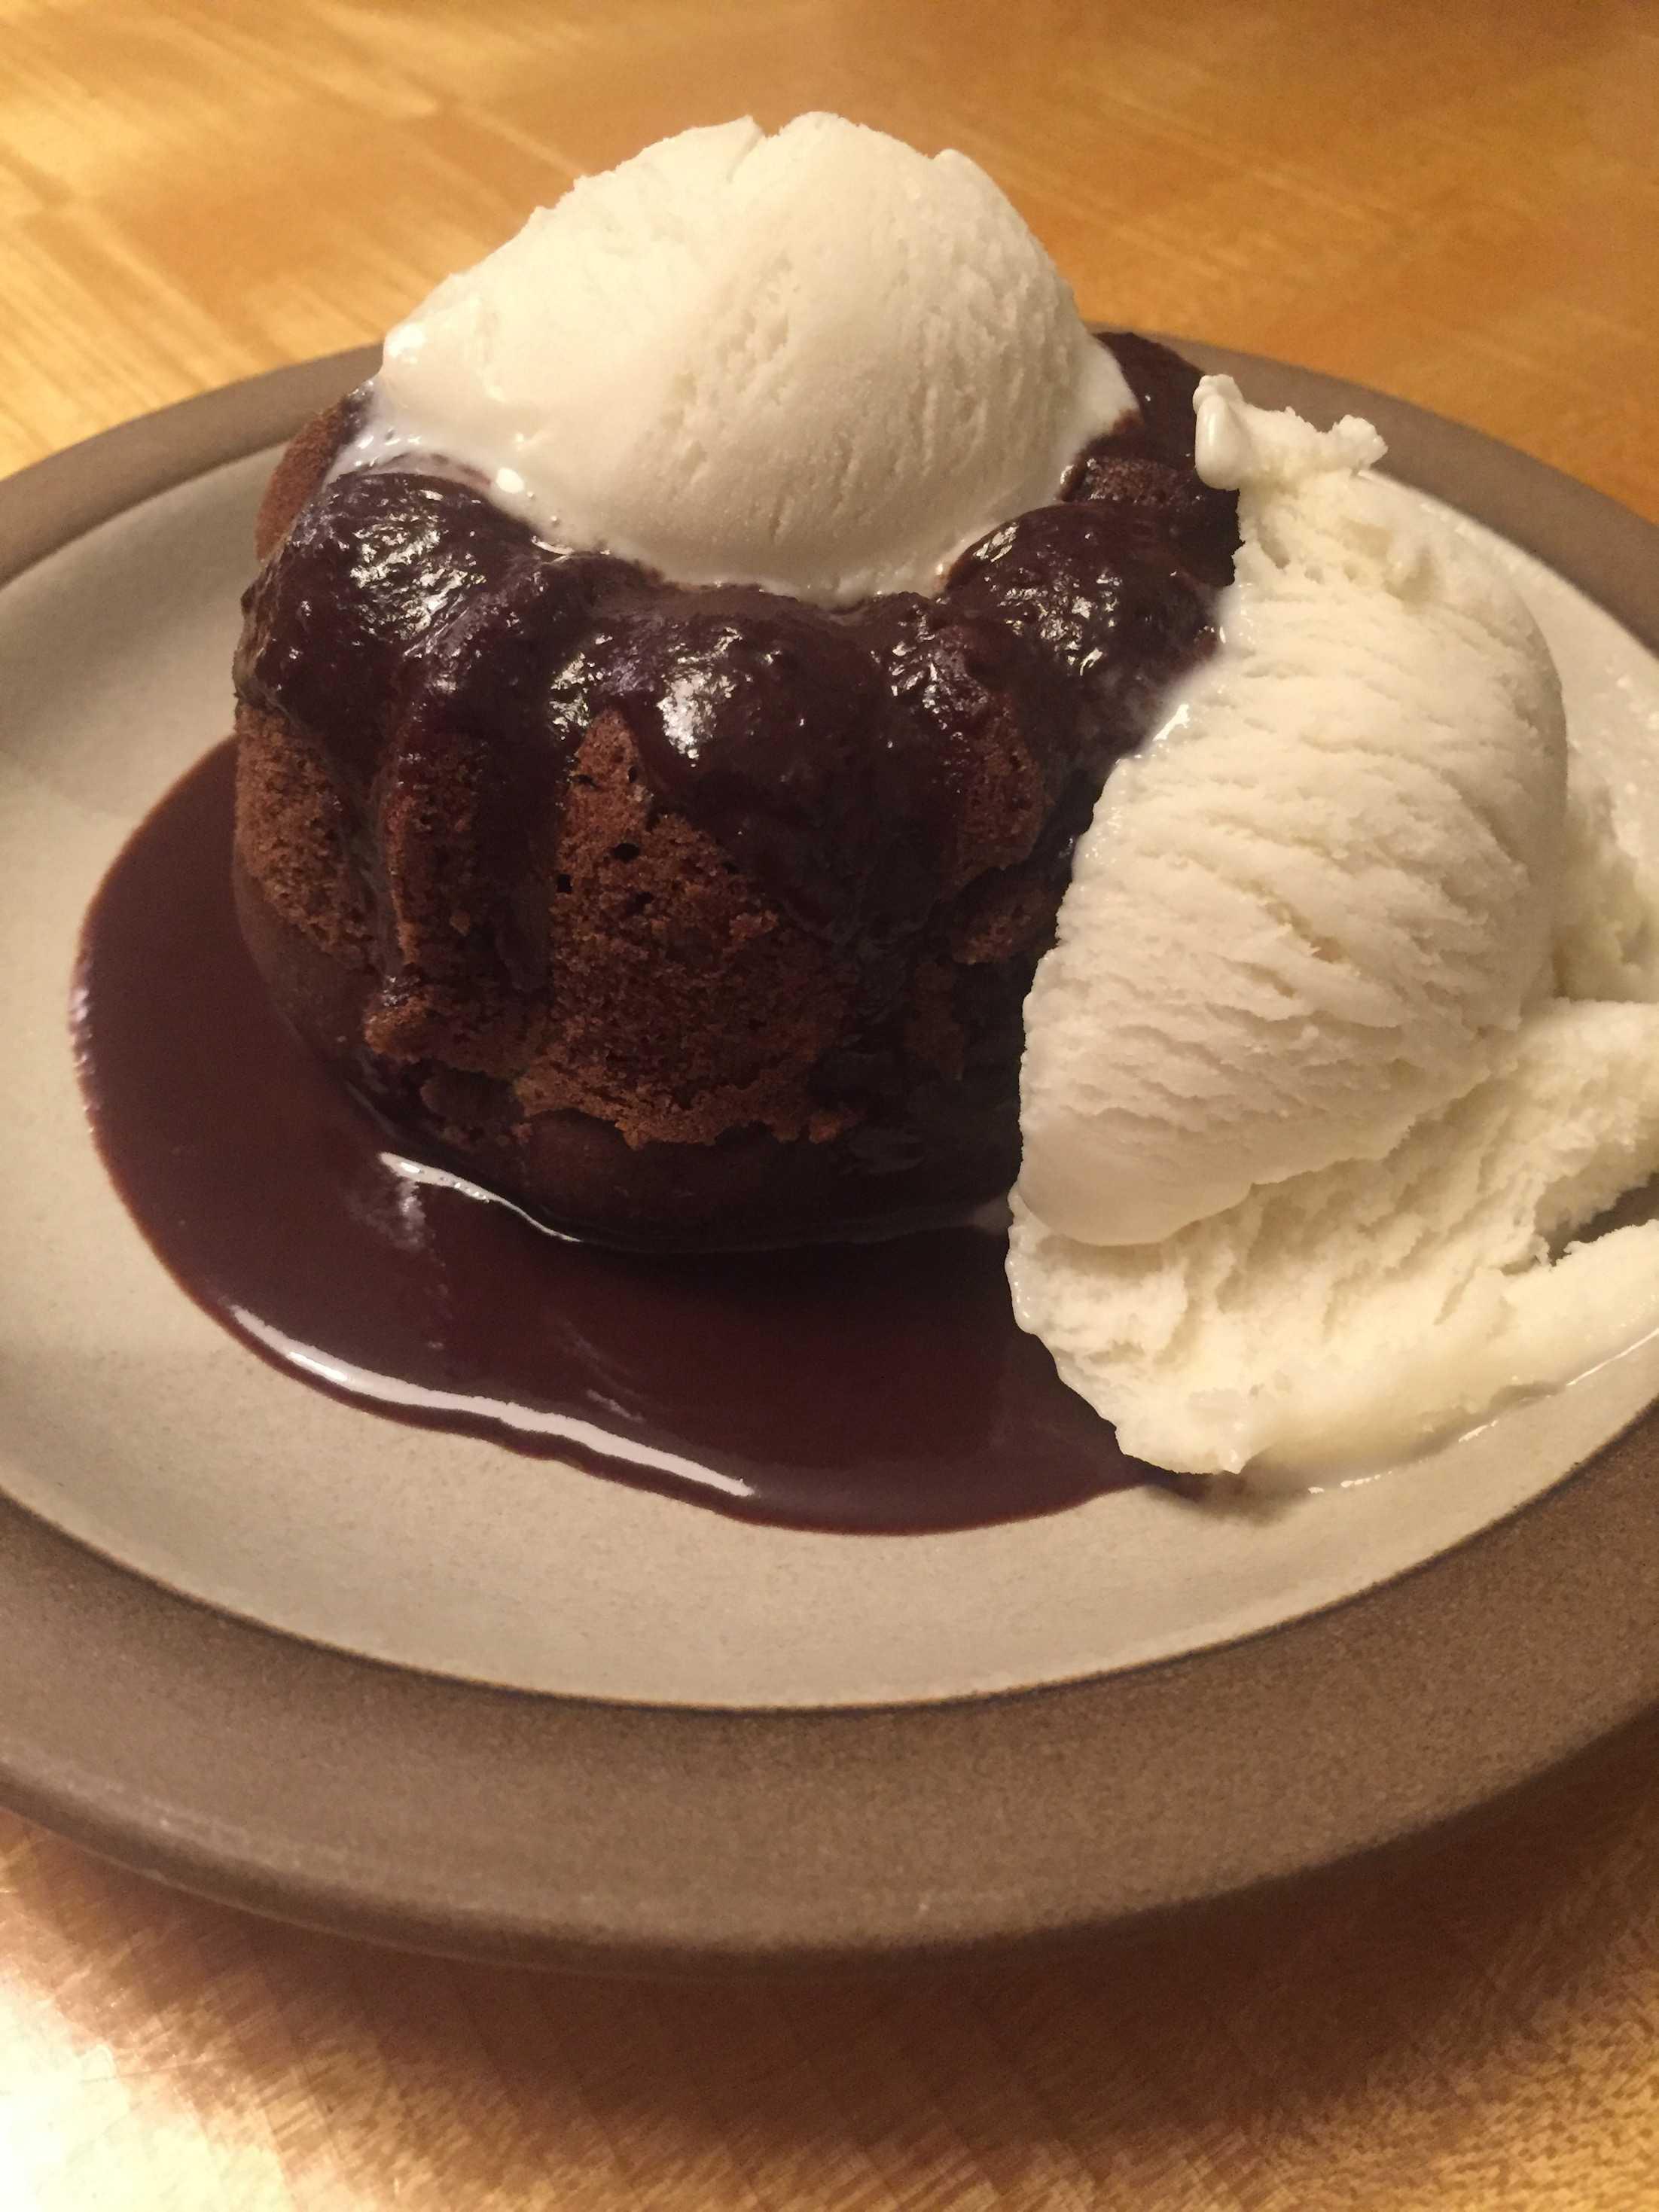 Mini bundt cake served with vanilla soymilk ice cream.